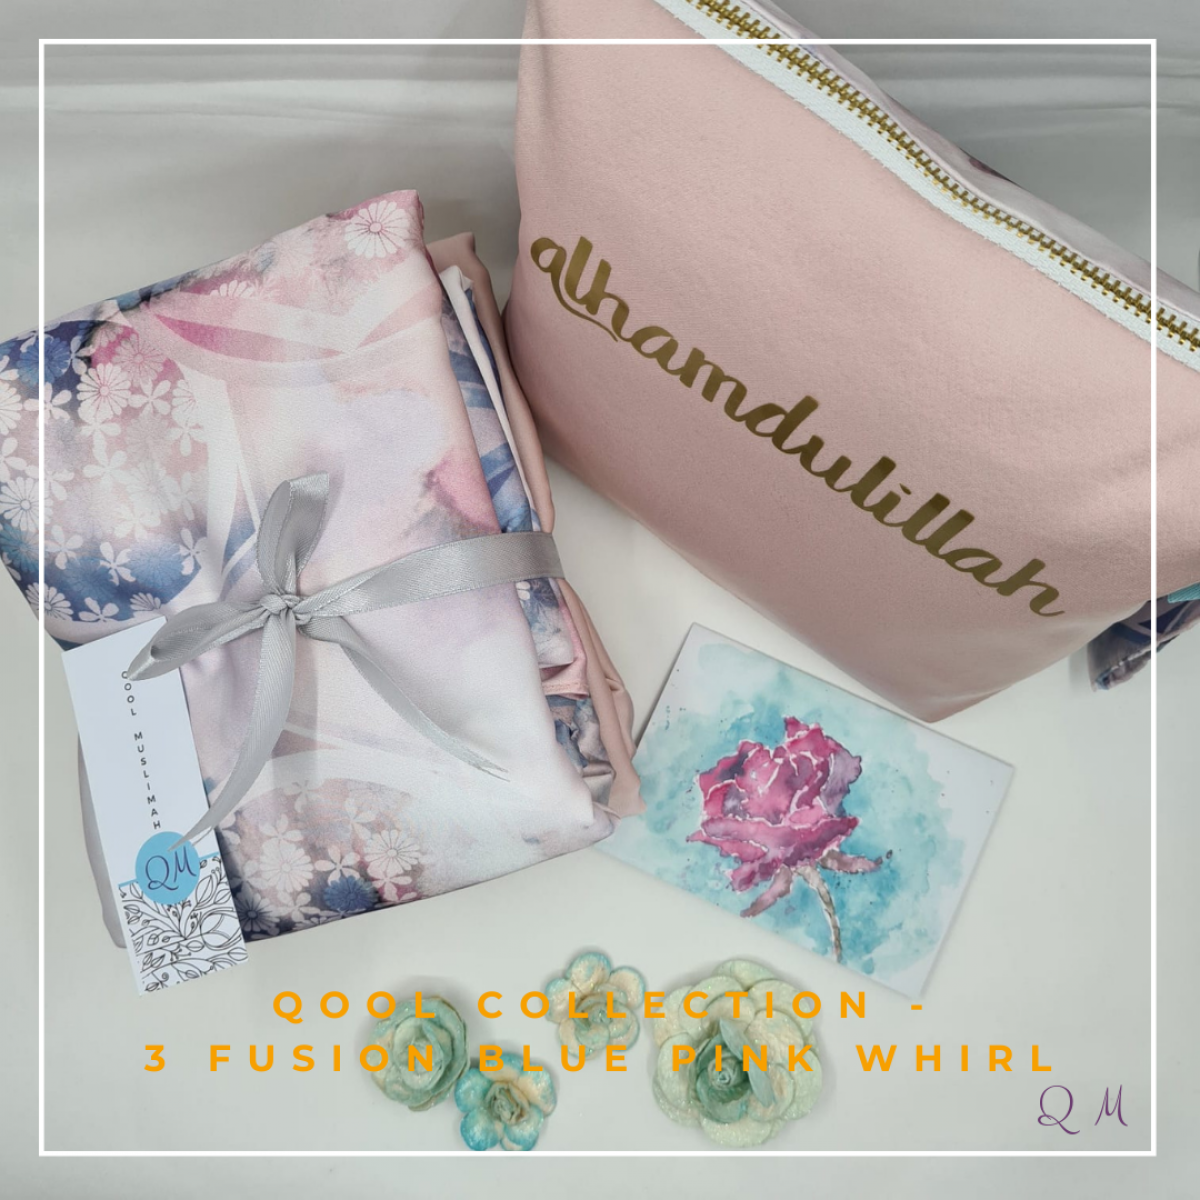 P24. Telekung/Mukena Armani Silk - Fusion Blue Pink Whirl - Qool Muslimah